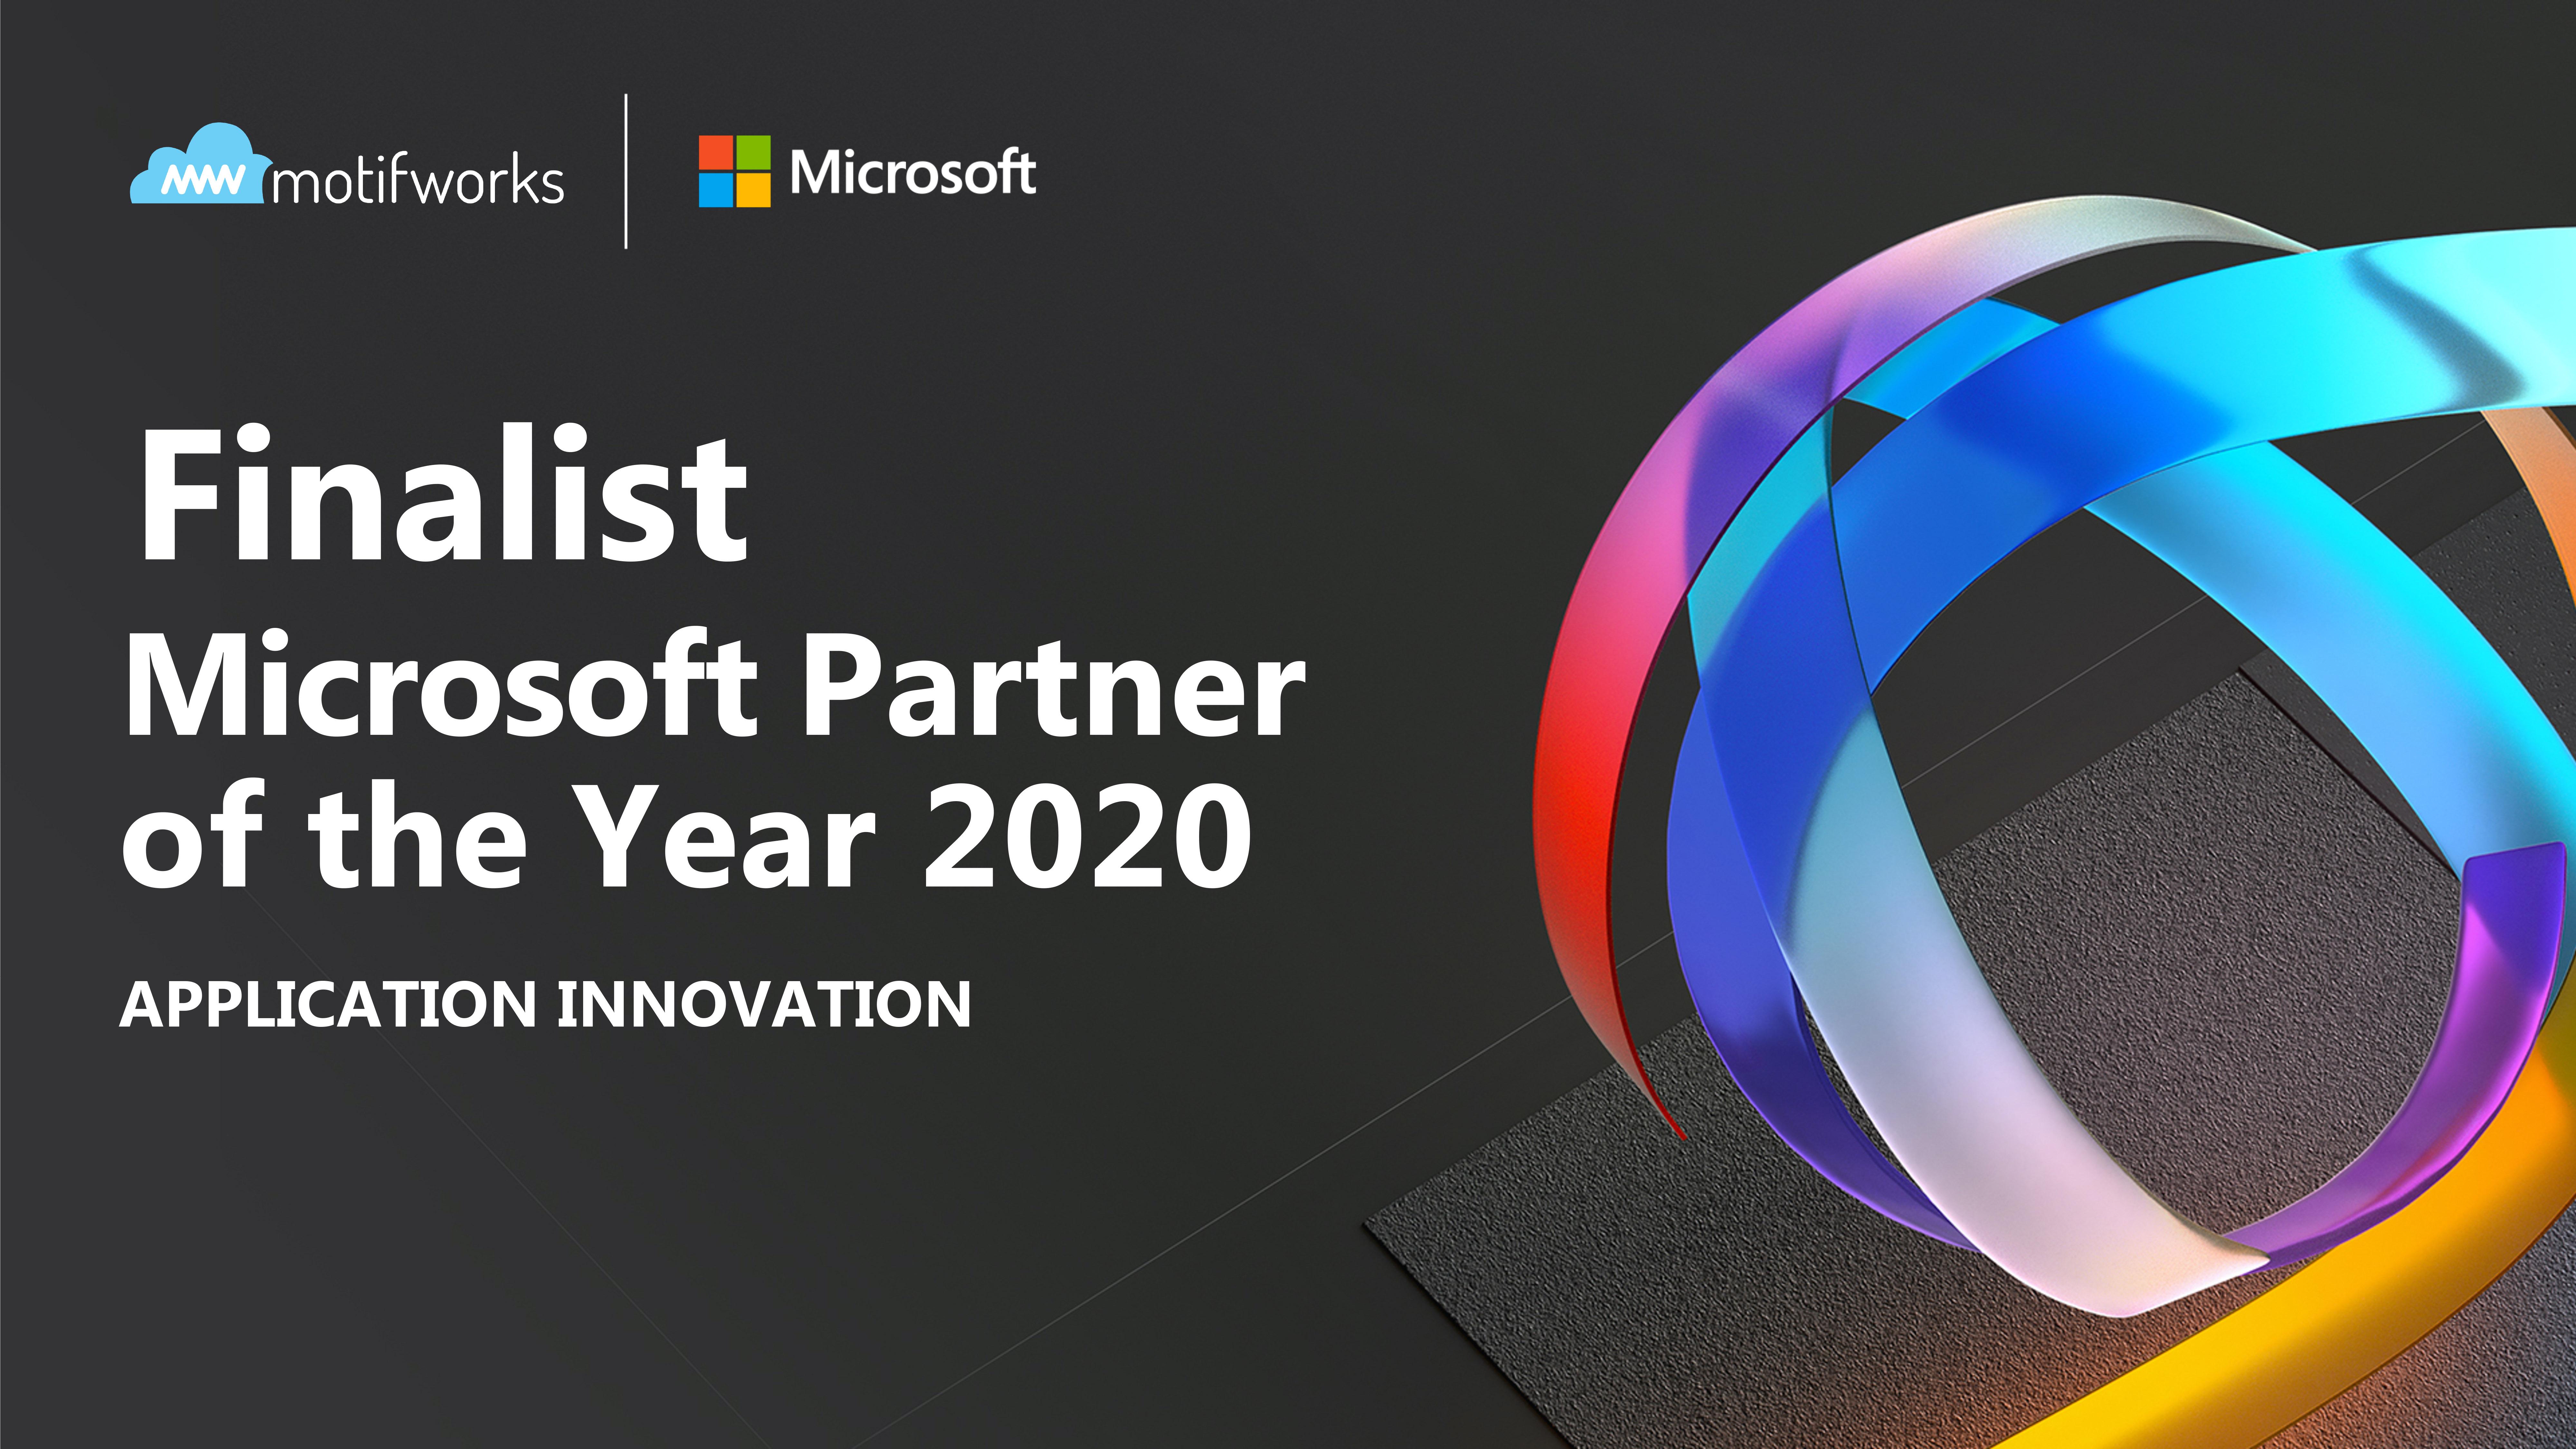 Motifworks - Microsoft's Partner of the Year Finalist 2020